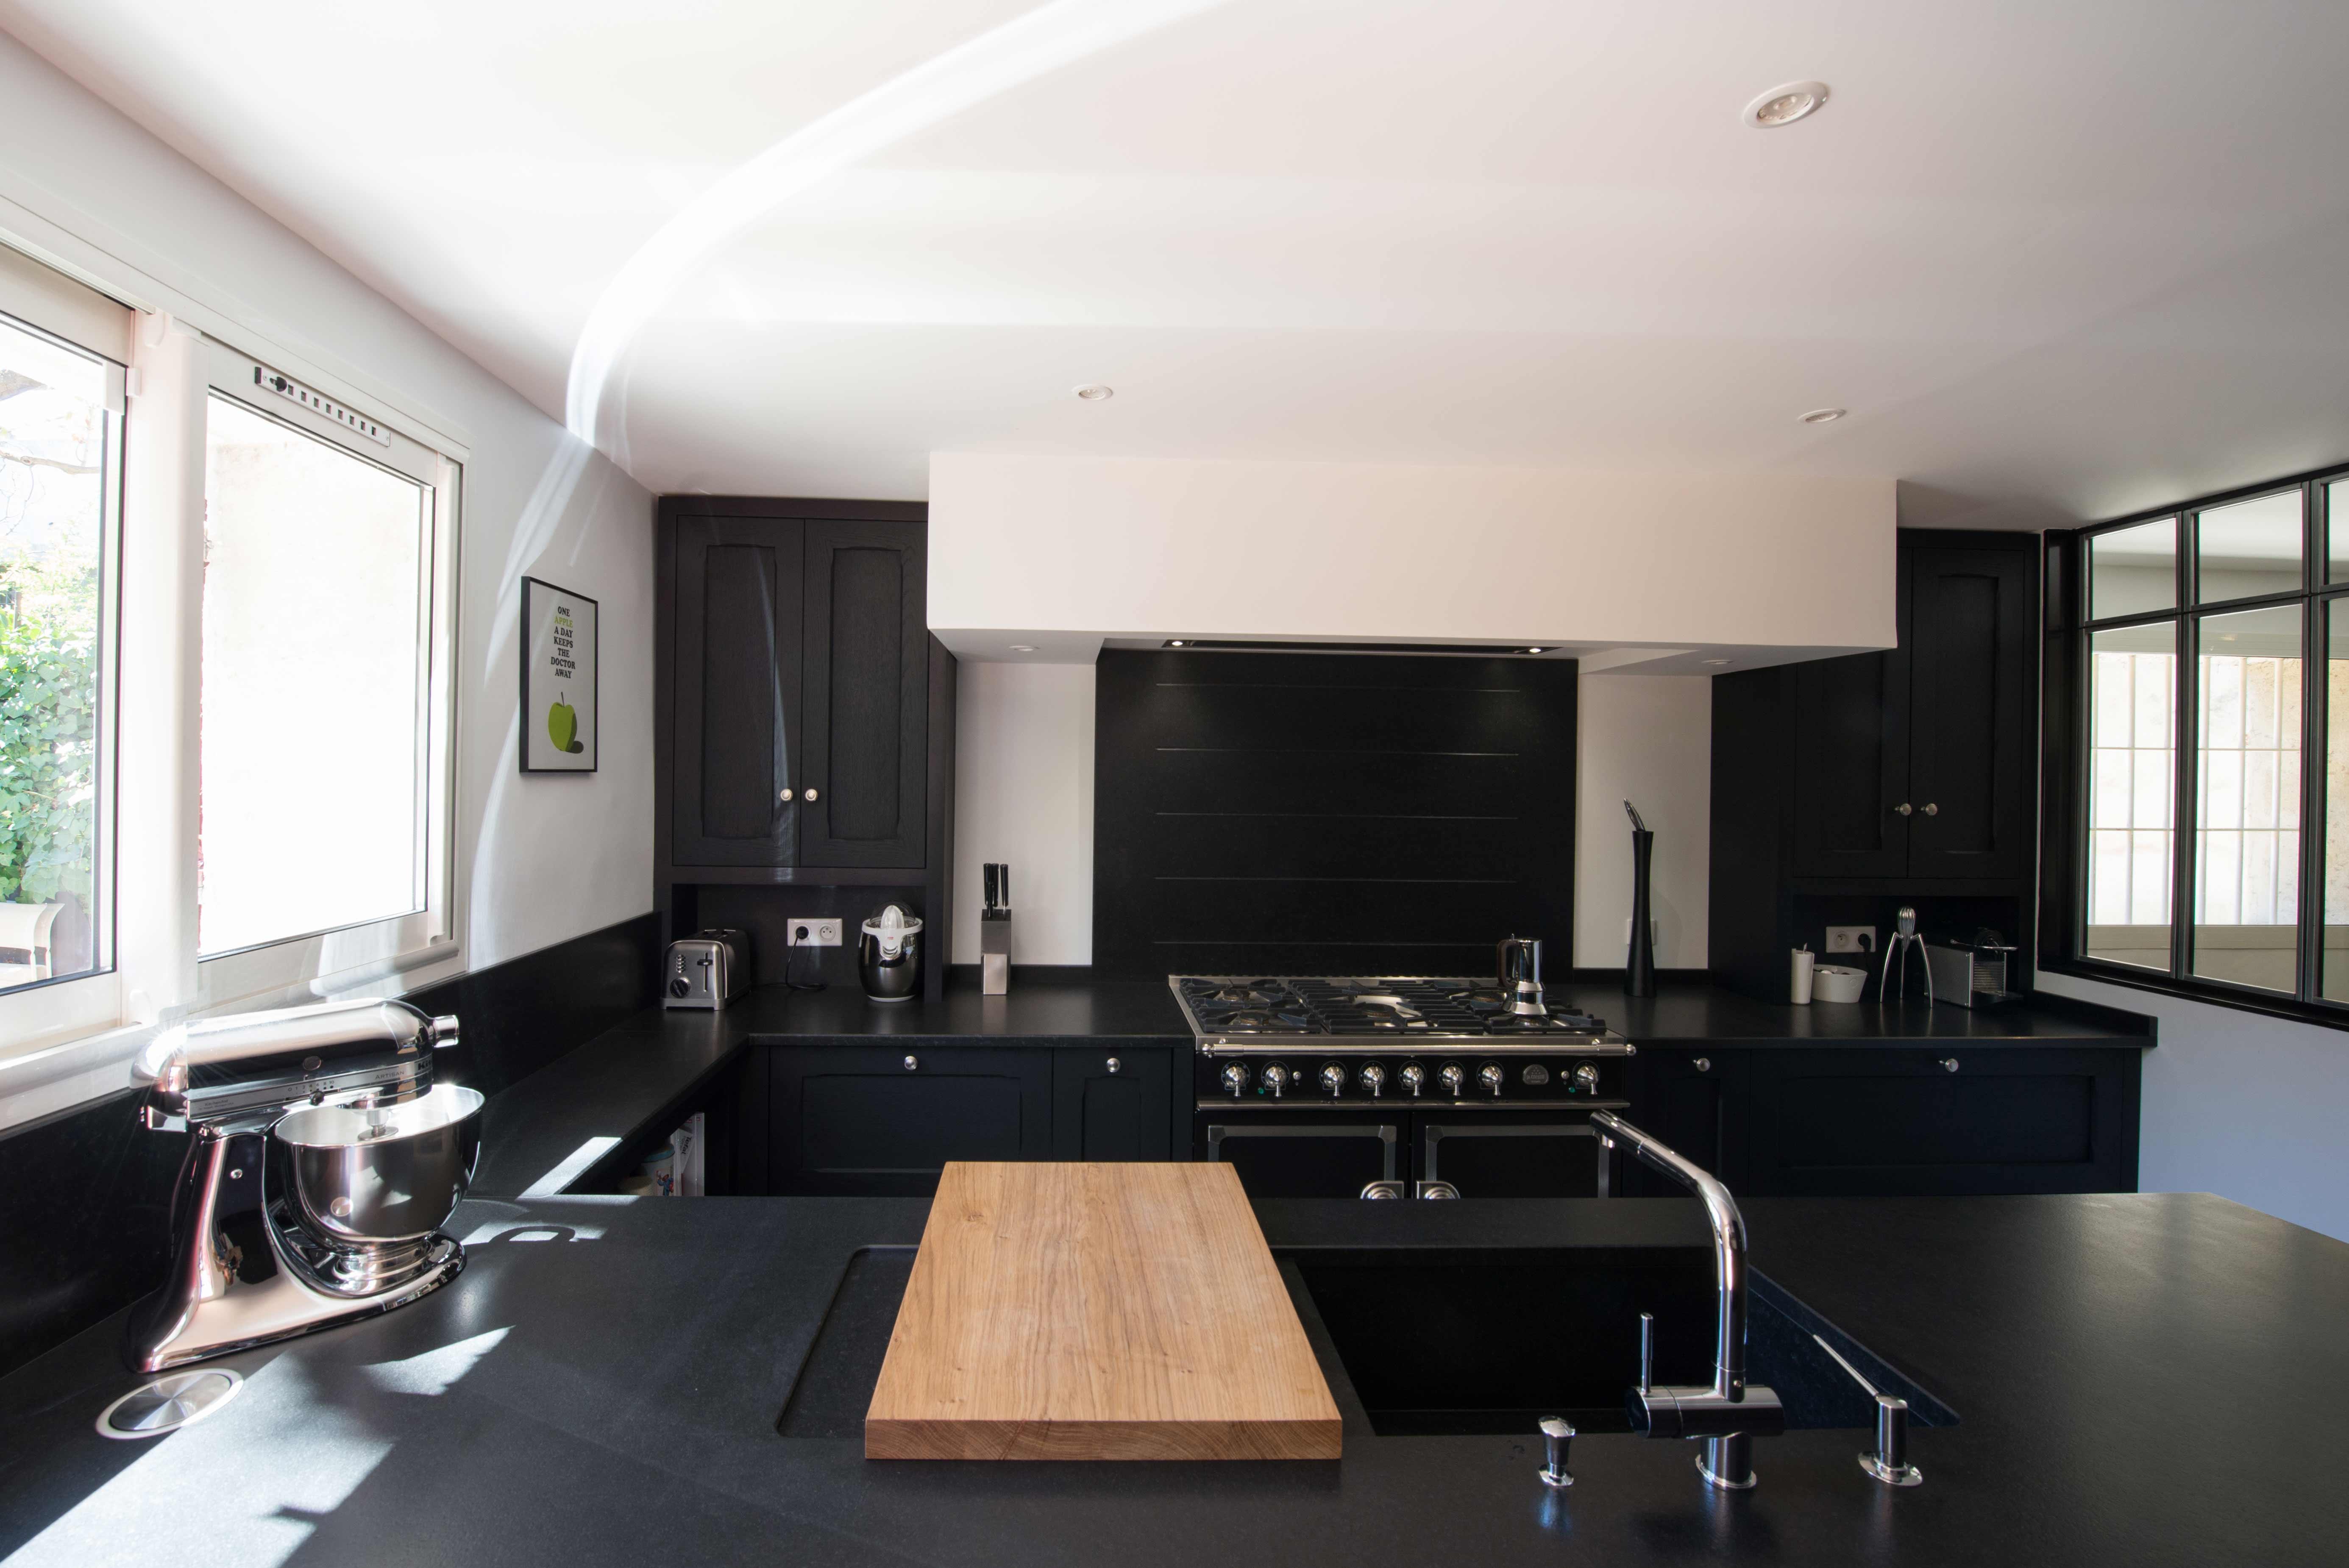 Wonderful Magasin Cuisine Avignon Concept Iqdiplom Com # But Magasin Le Pontet Television